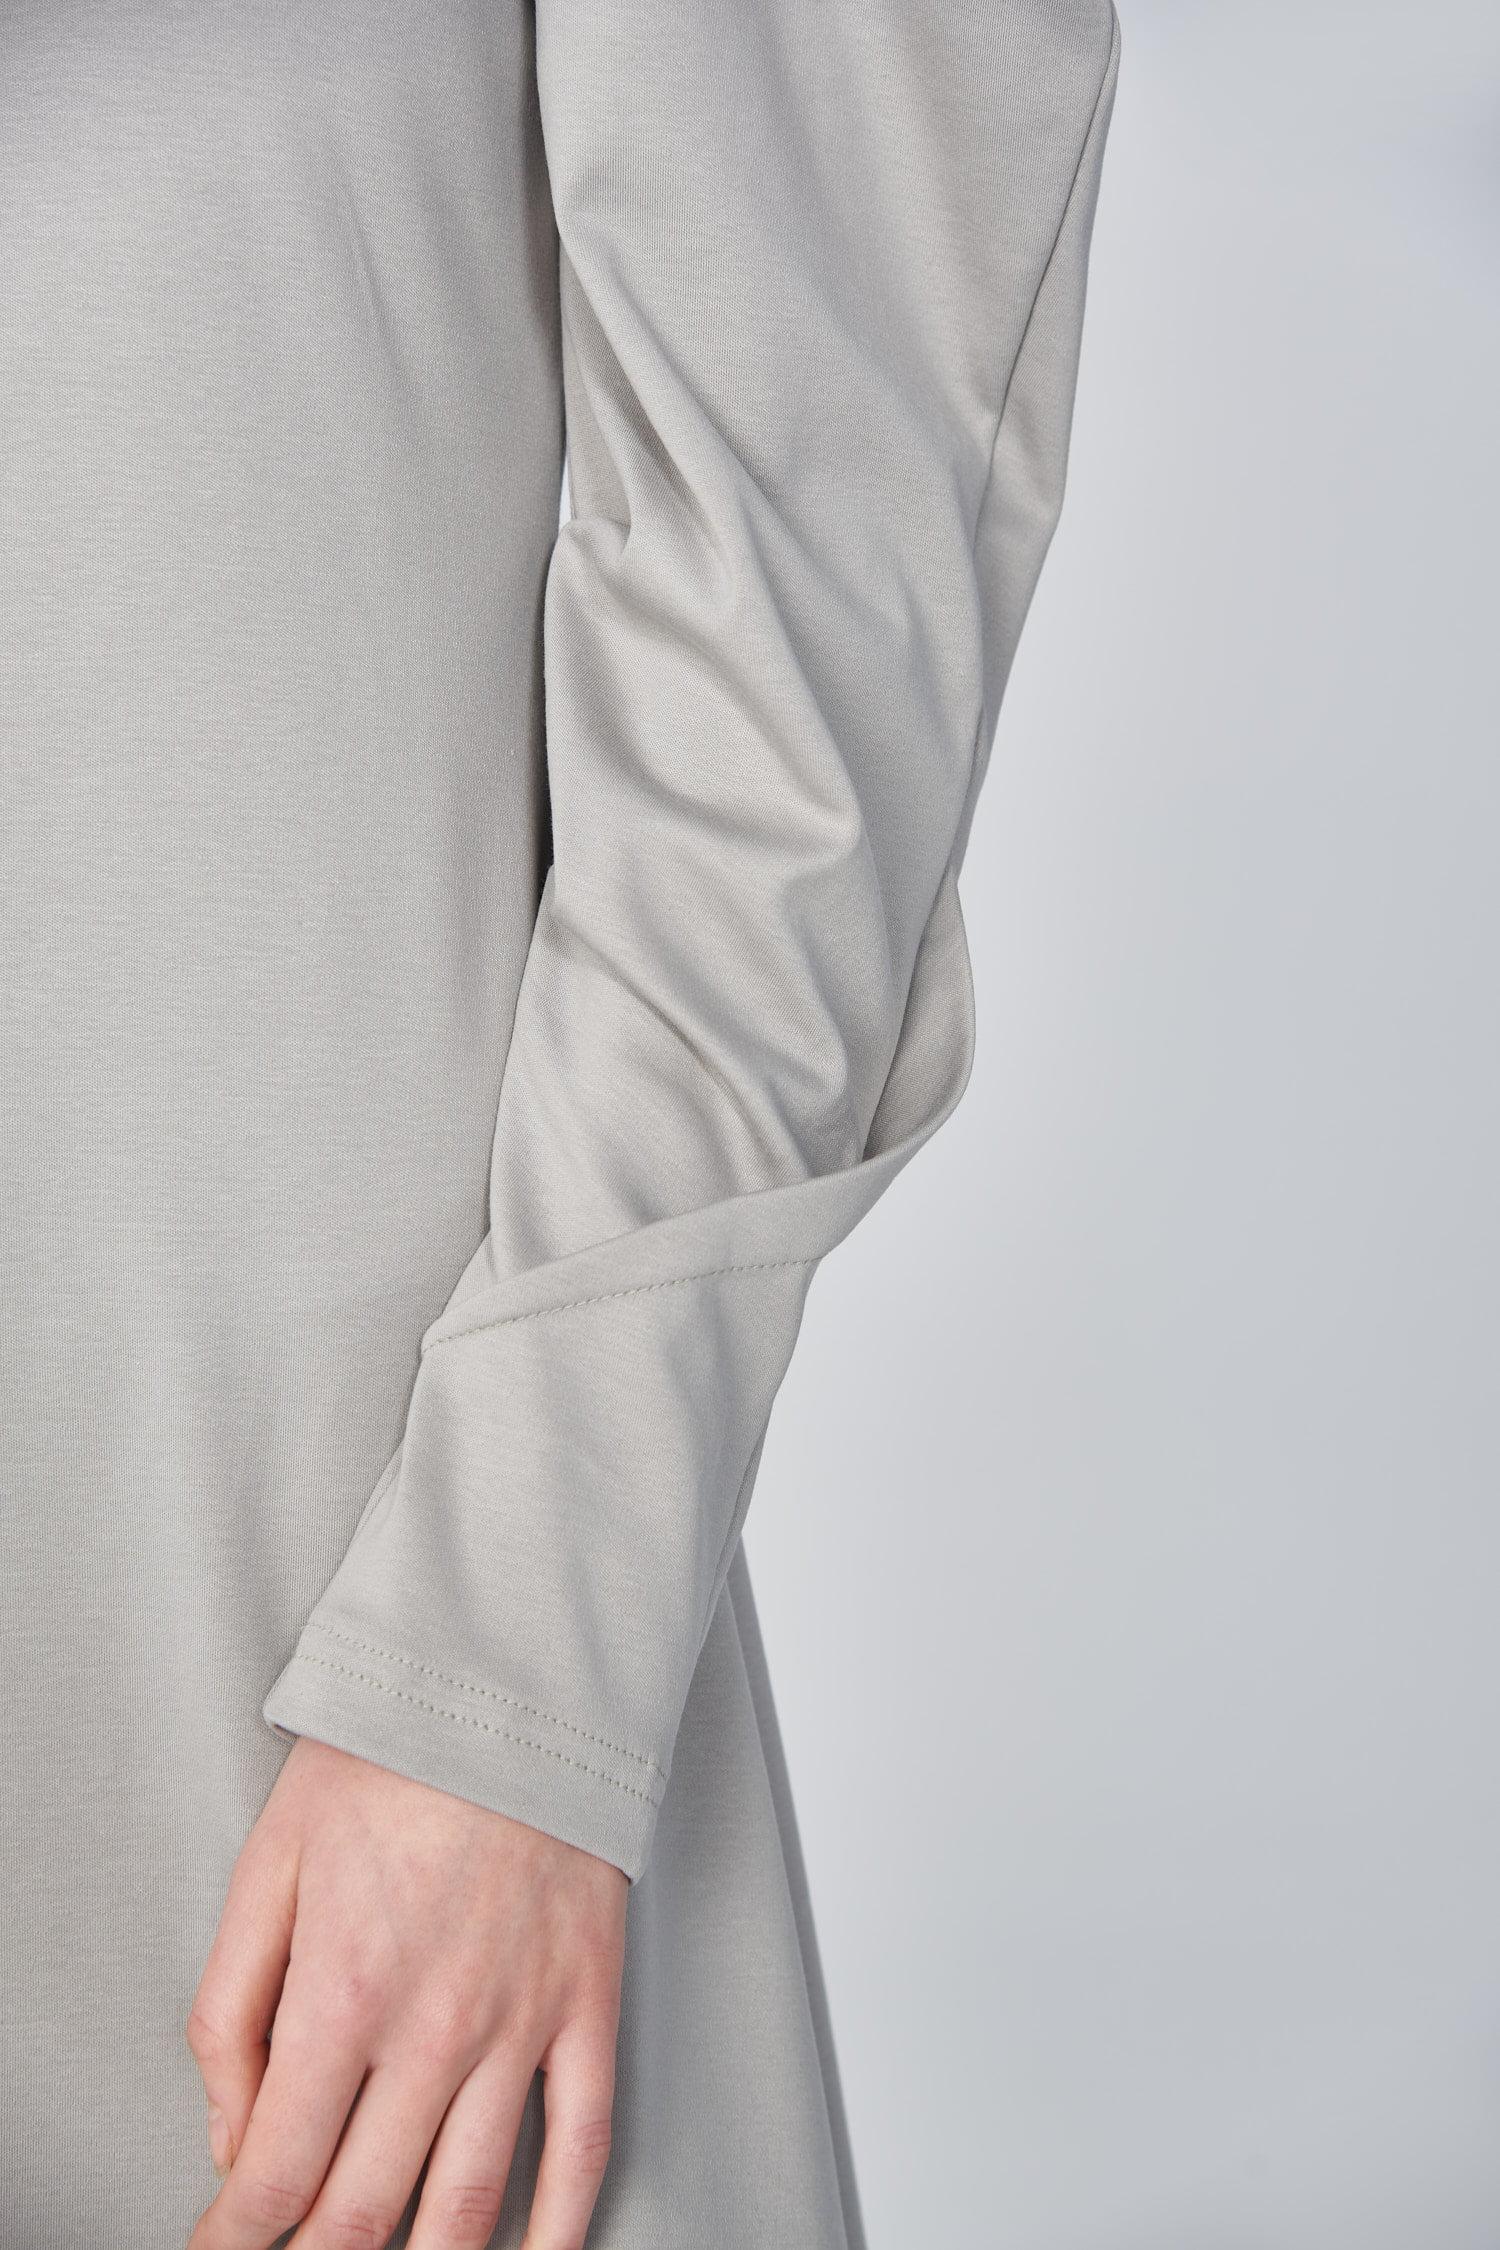 Acephala Ss21 Mini Dress With Draped Sleeves Sleeve Detail